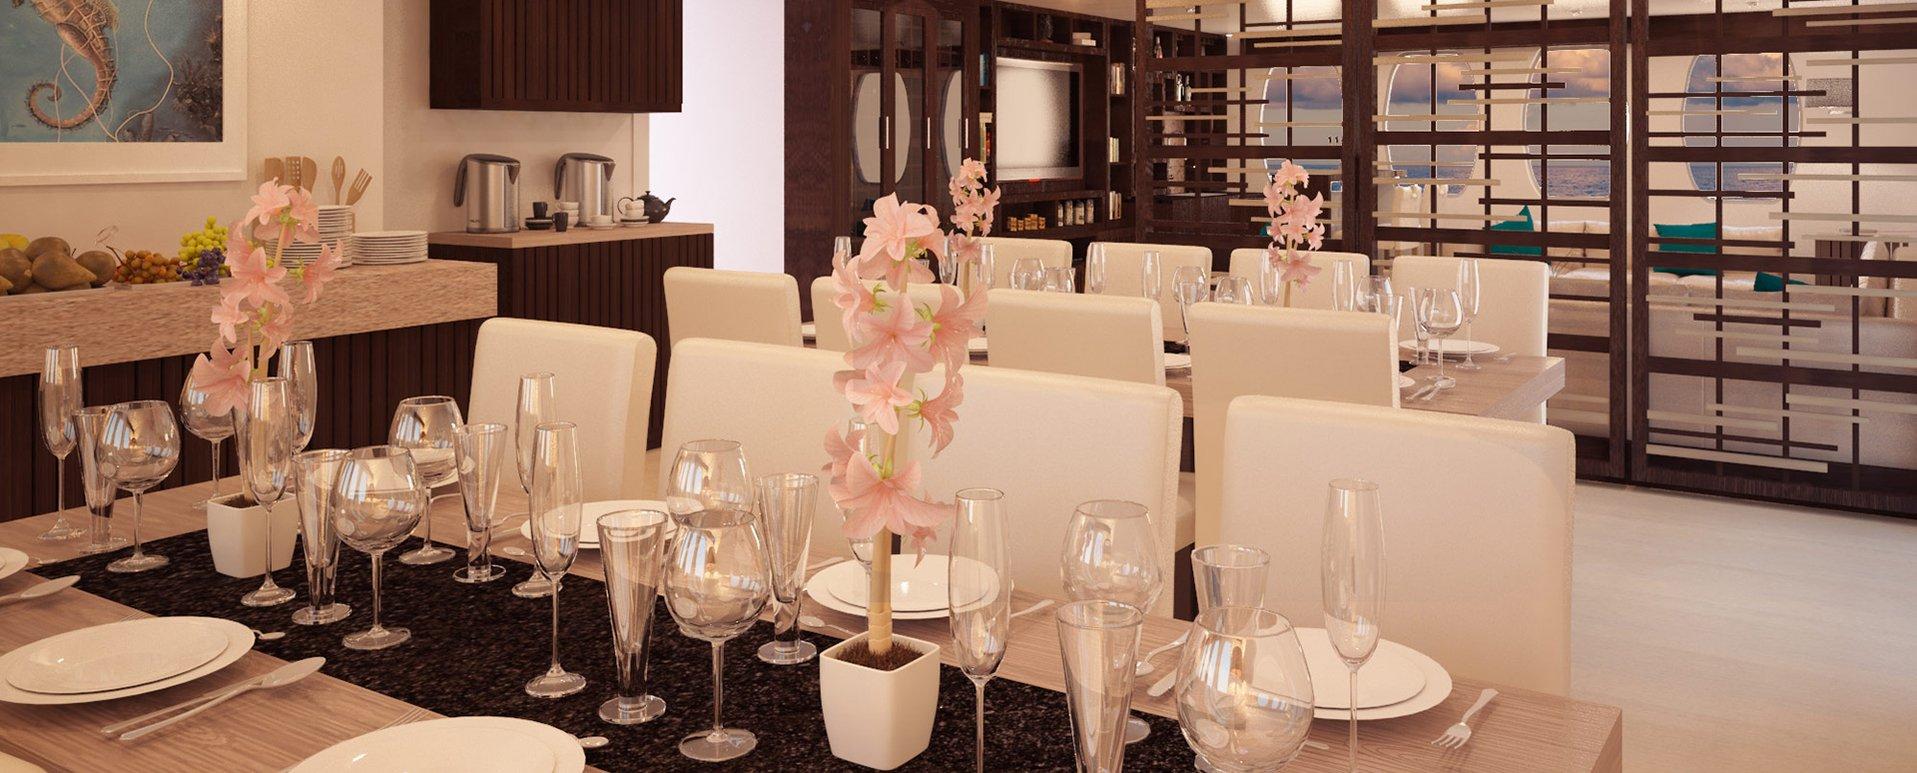 Alya Catamaran balcony dining